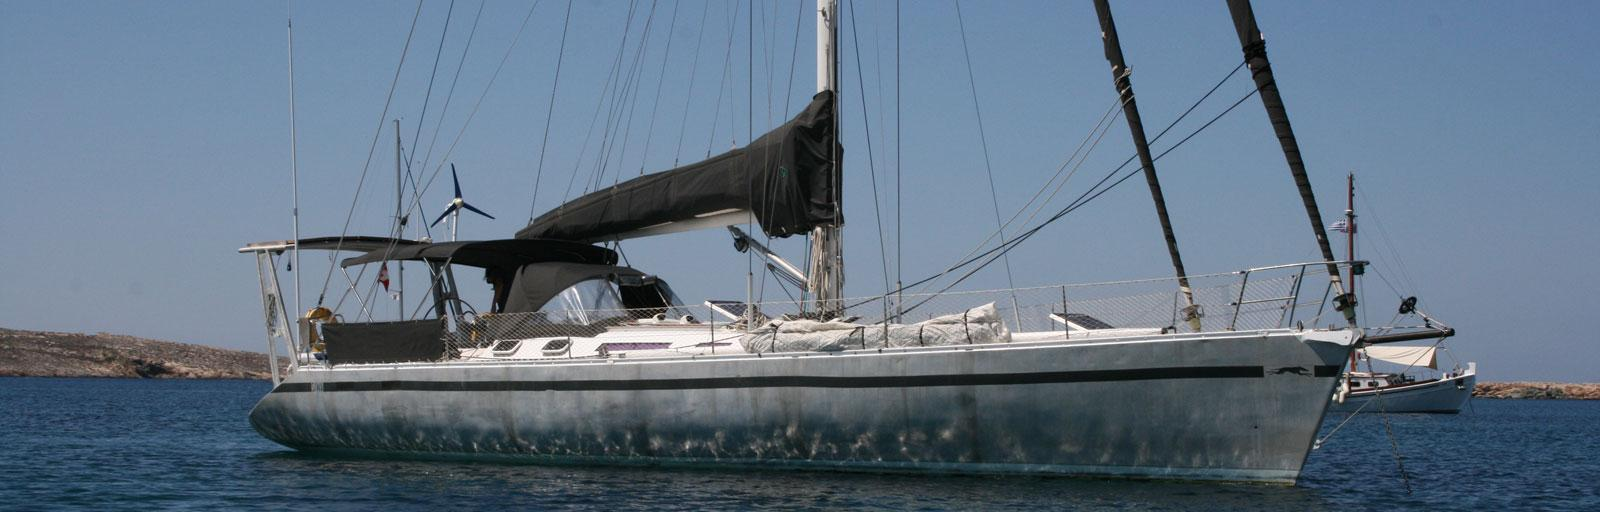 AYC Yachtbrokers - Lévrier des mers 16m